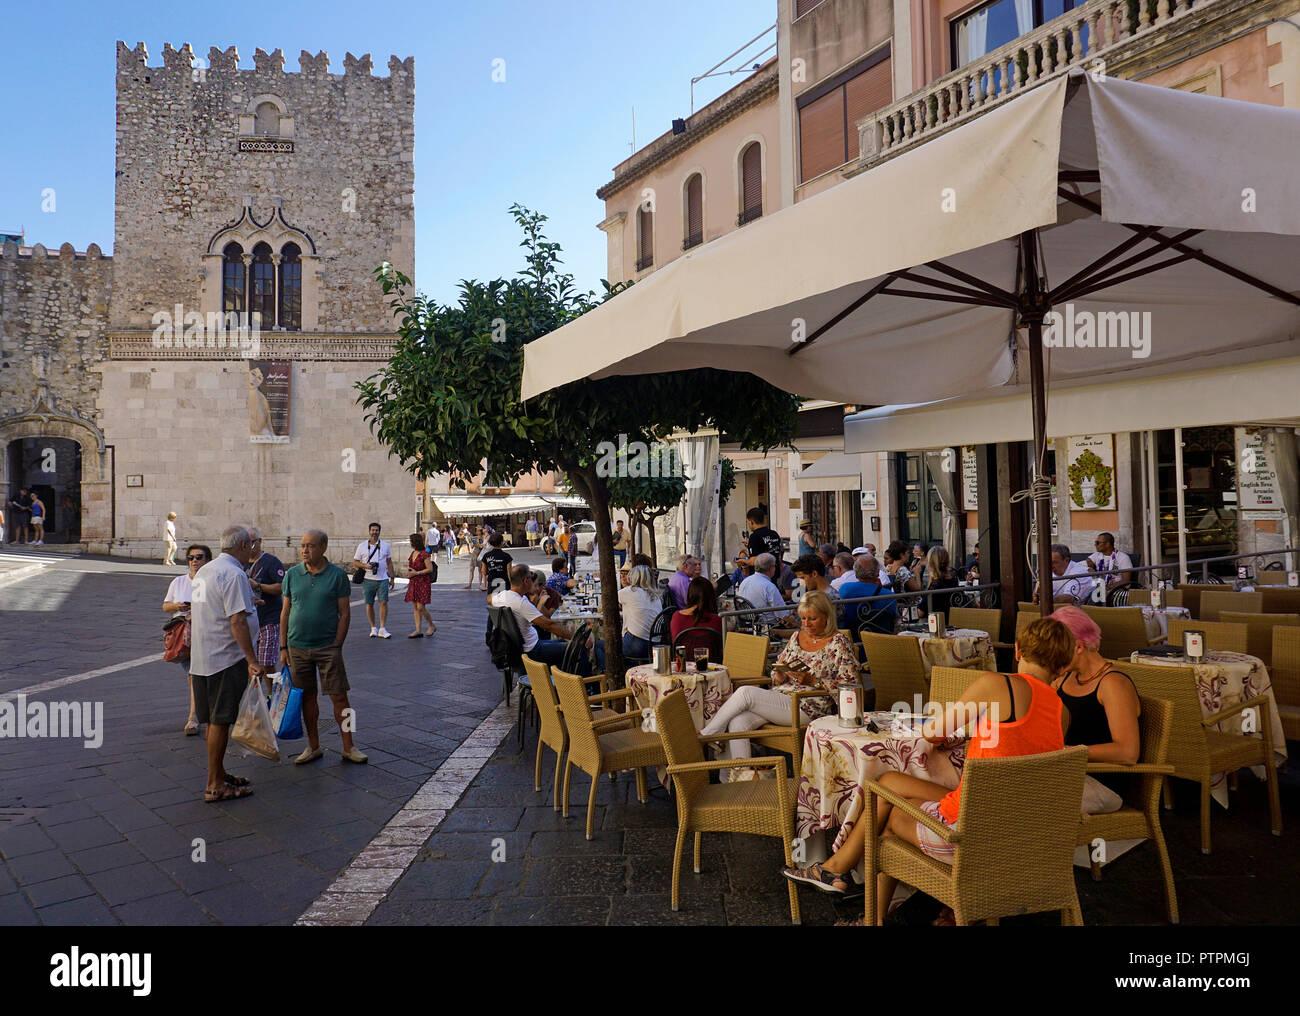 Street cafe at Palazzo Corvaja, medieval palace at Taormina, Sicily, Italy Stock Photo